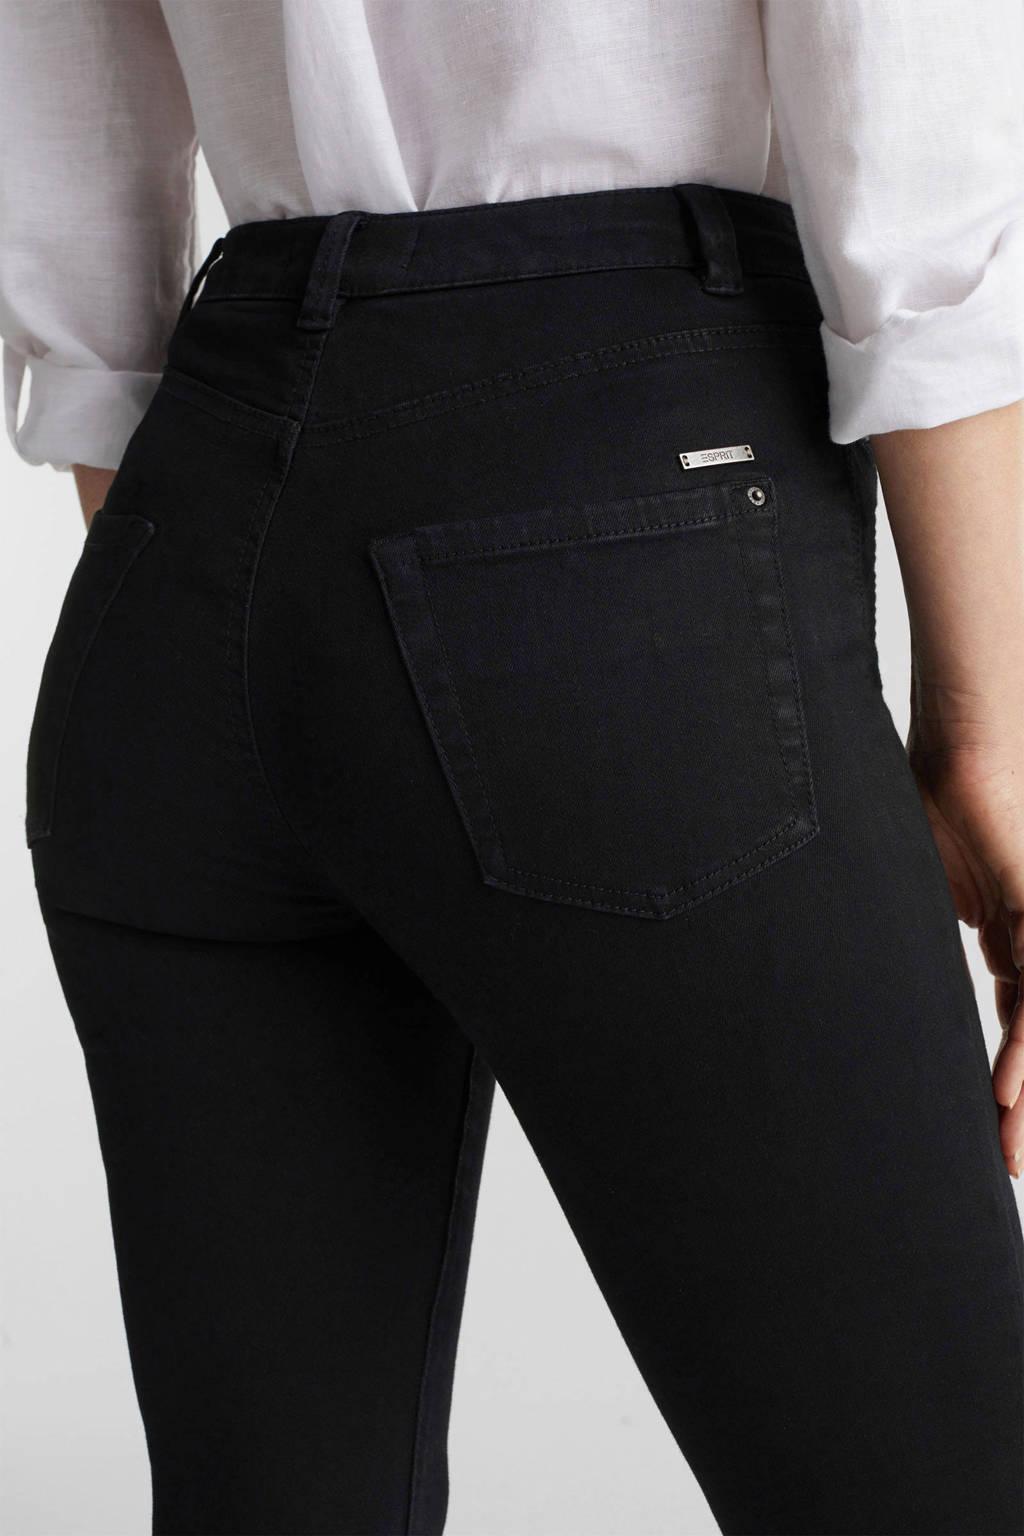 ESPRIT Women Casual skinny jeans zwart, Zwart